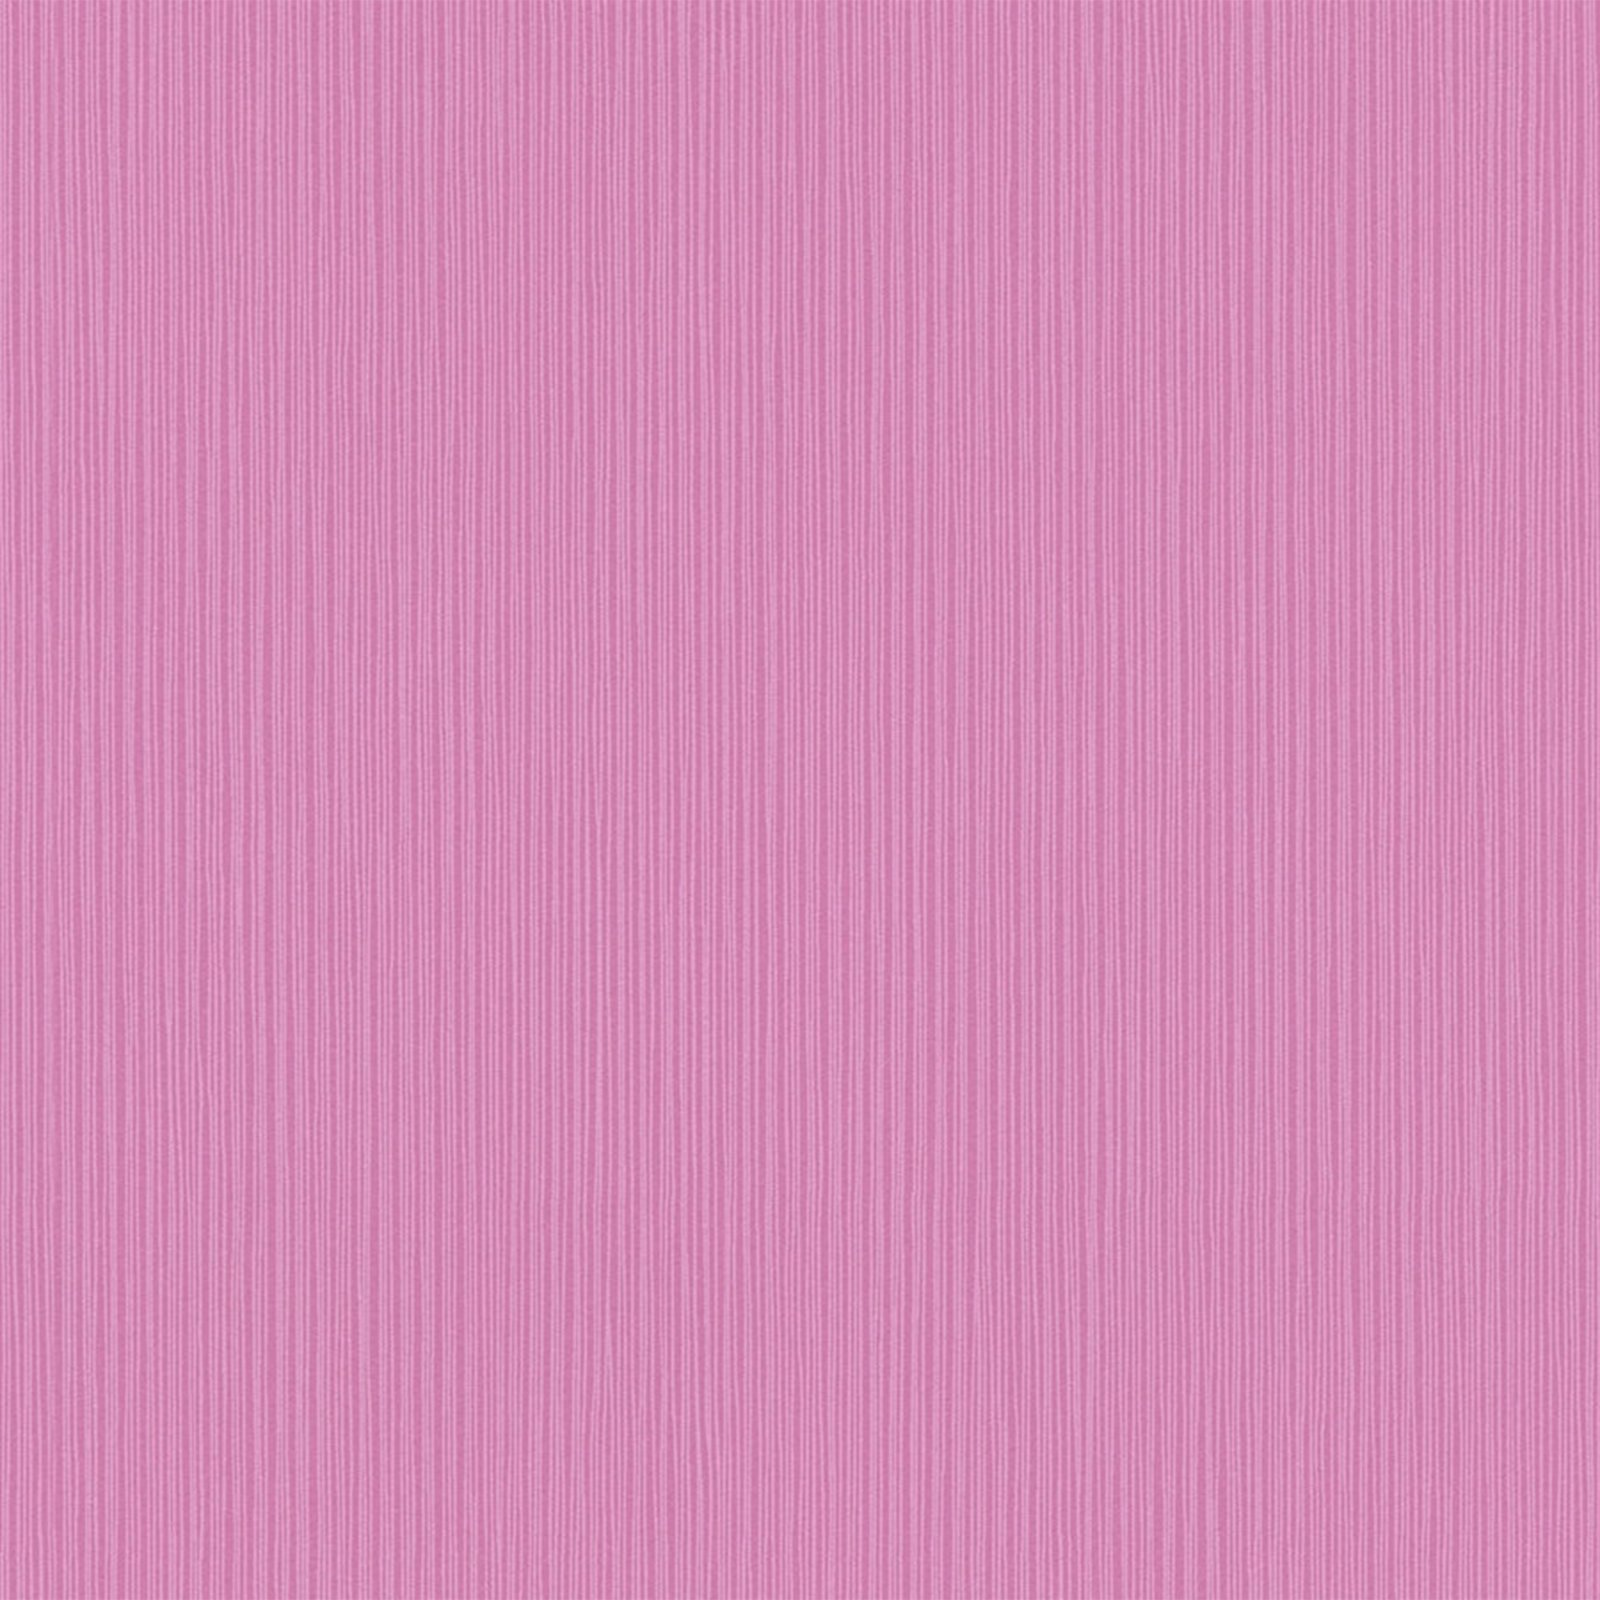 Vliestapete HAPPY SPRING - violett - 10 Meter